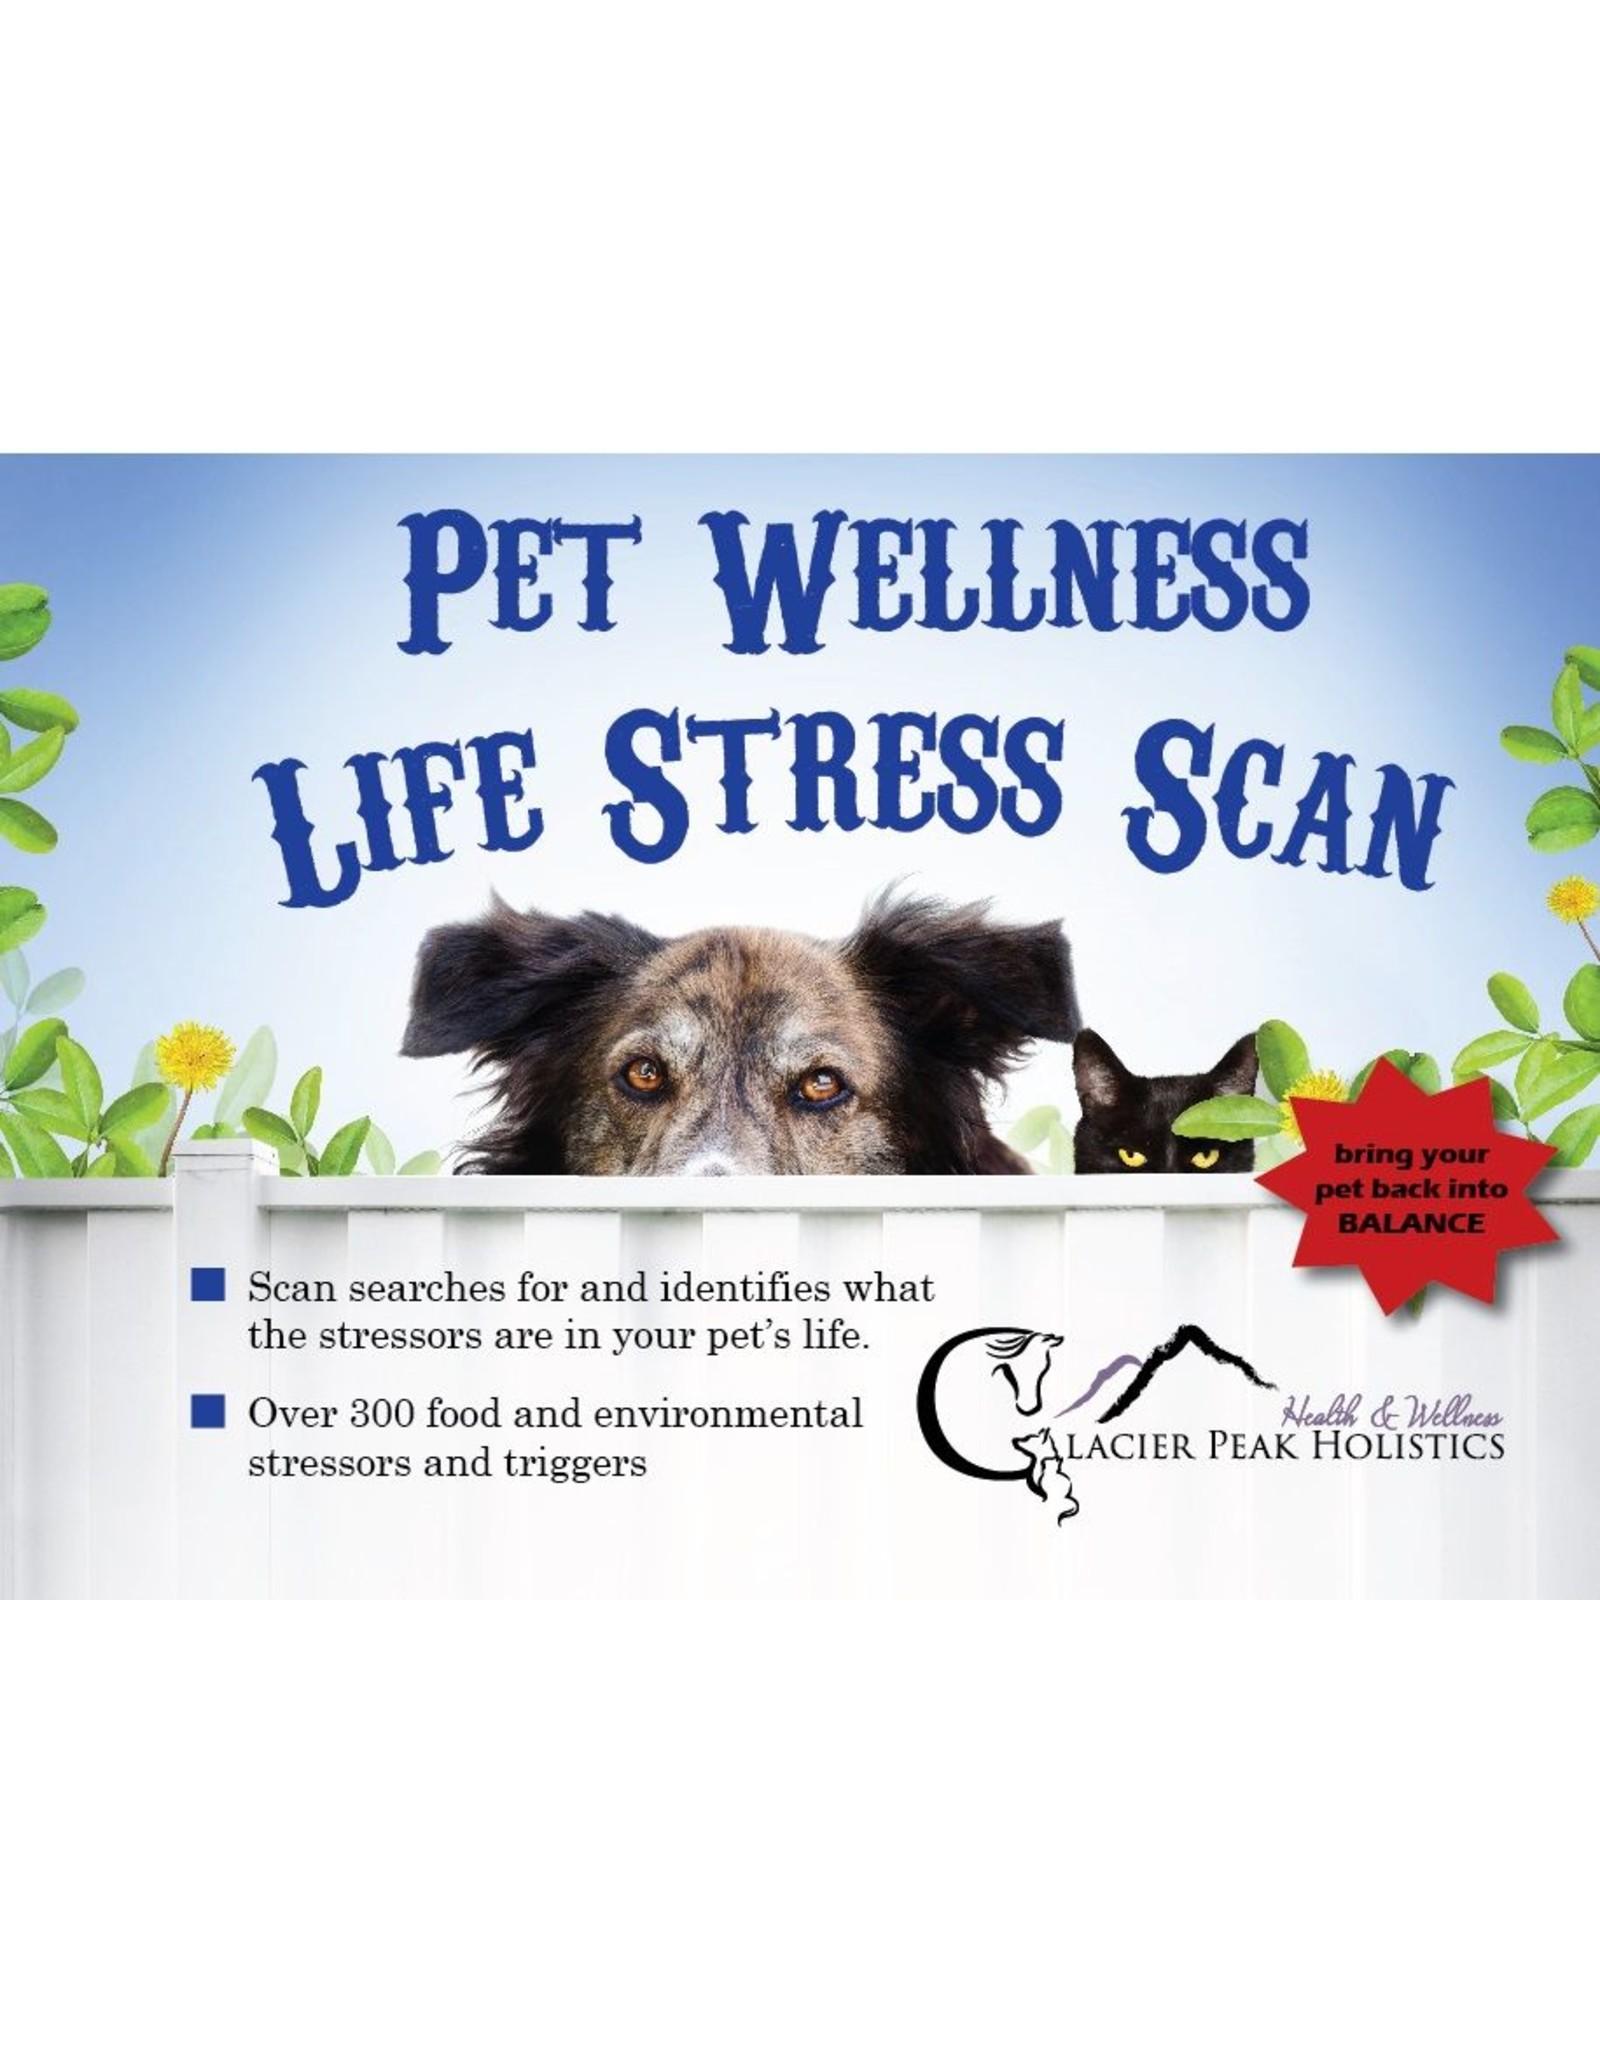 Glacier Peak Holistics Pet Wellness Life Stress Scan